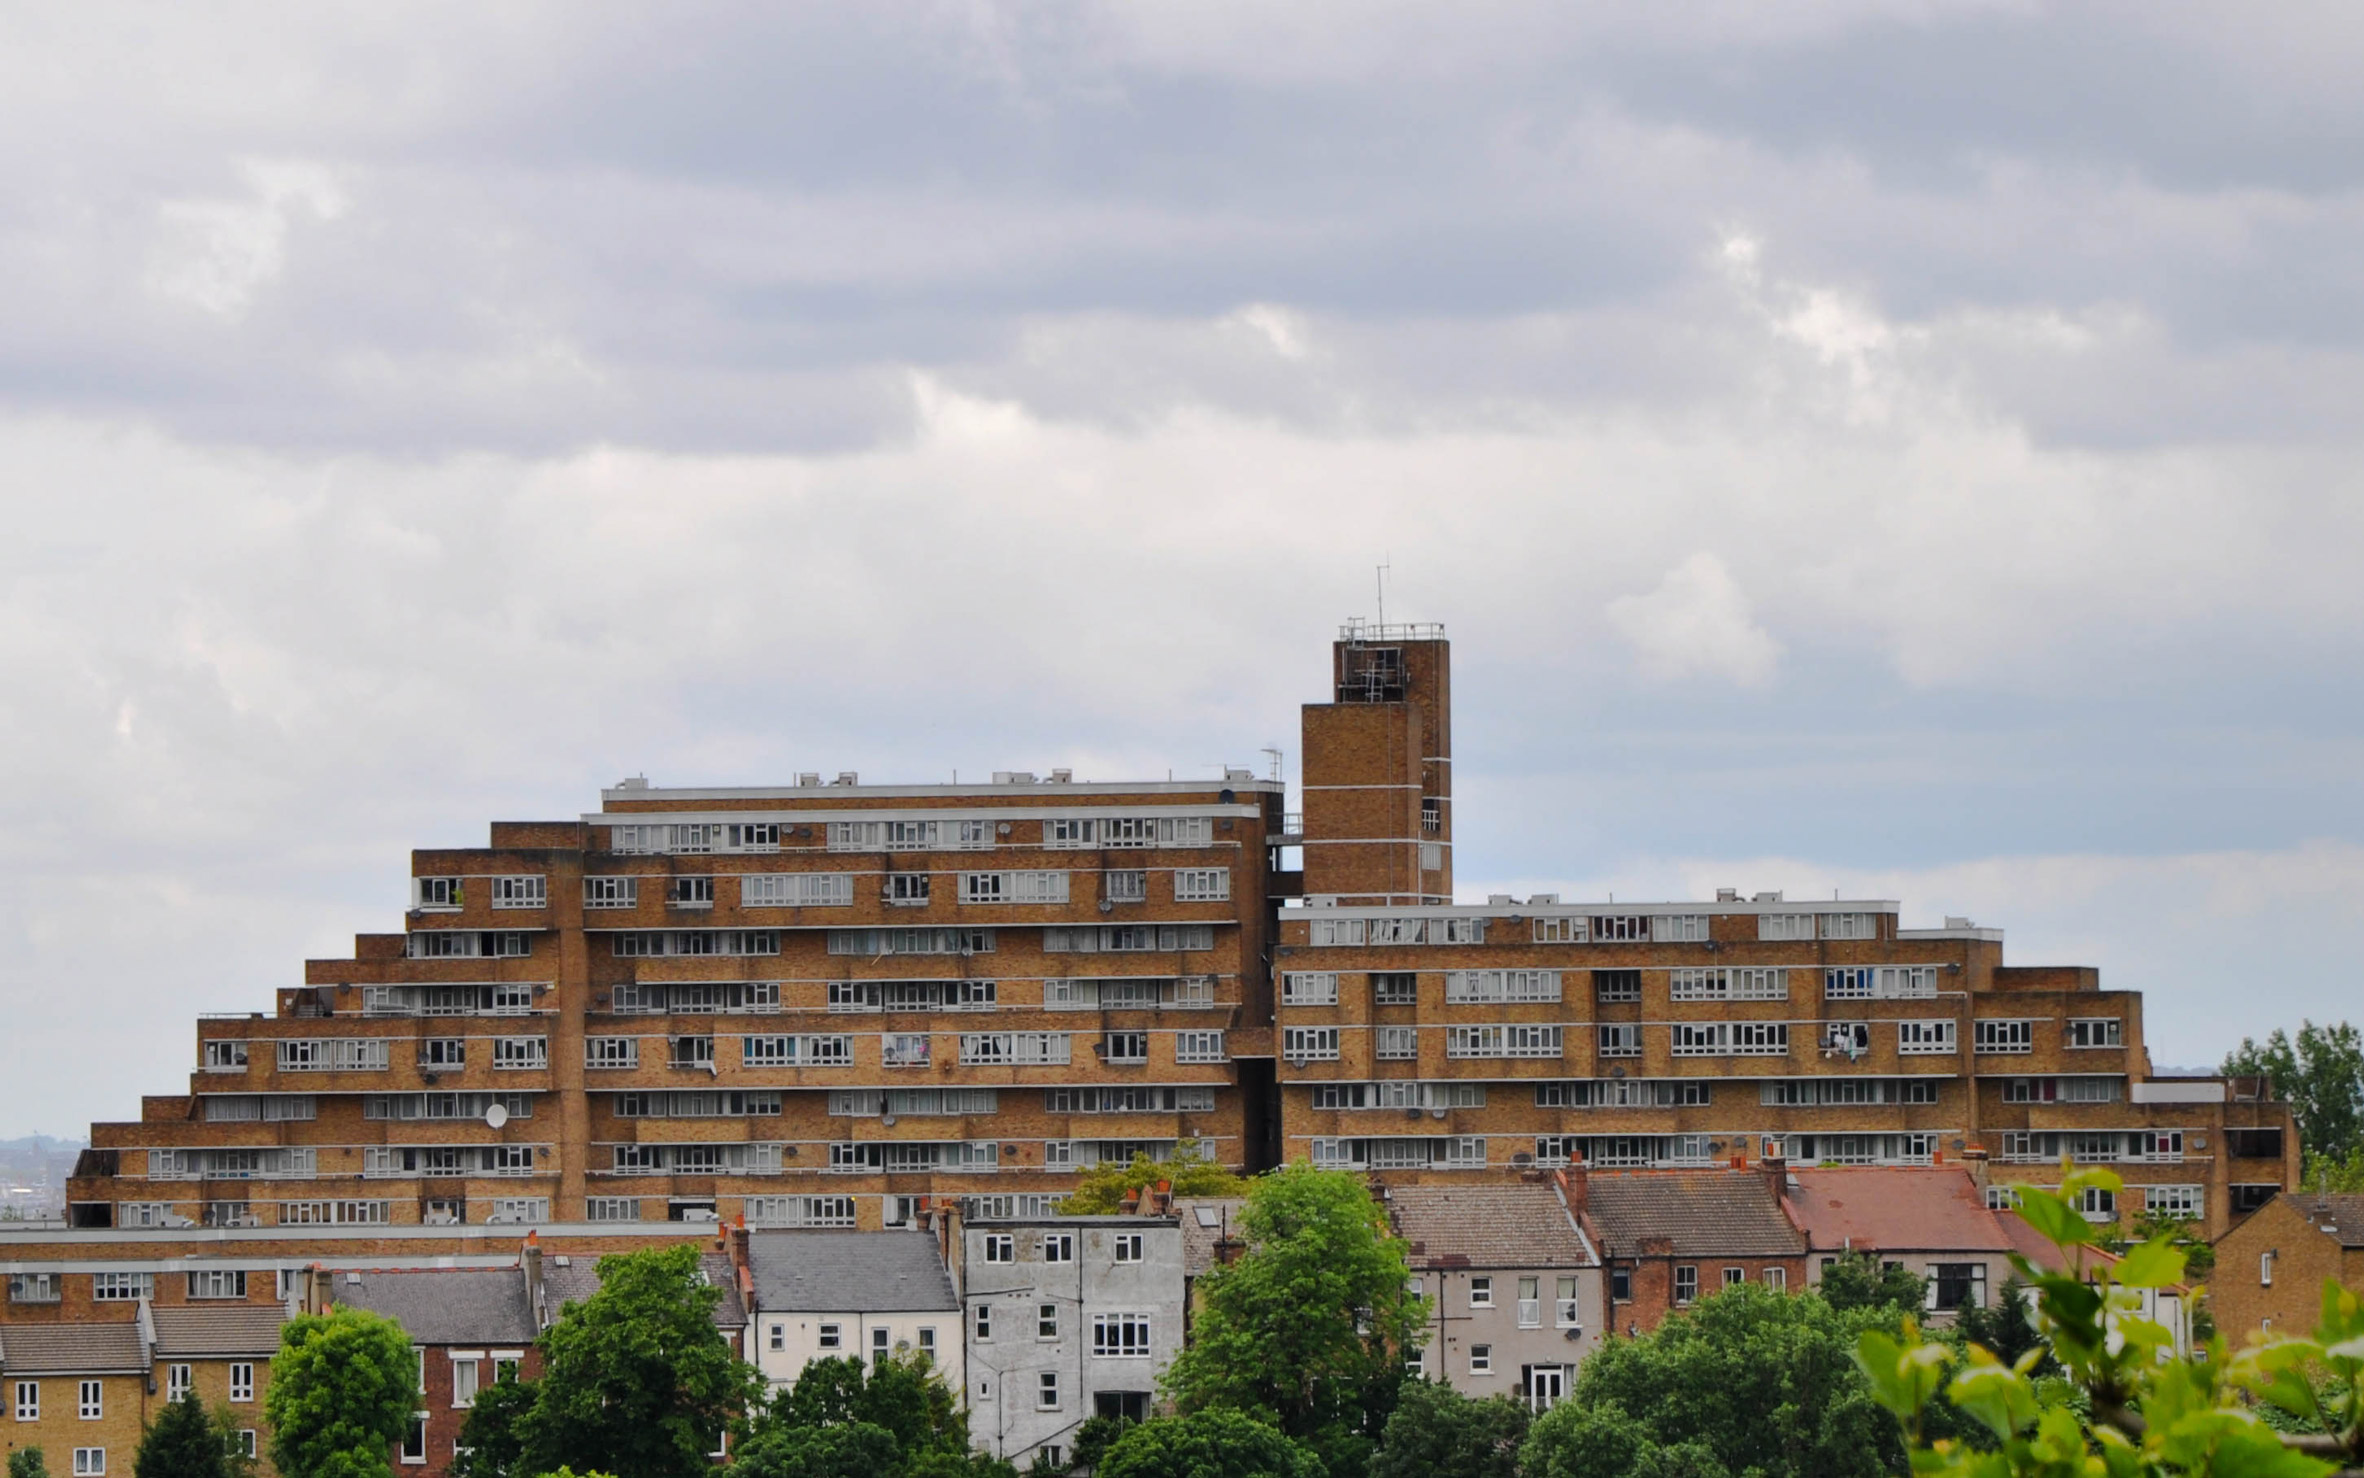 Dawson's Heights by Kate Macintosh in London